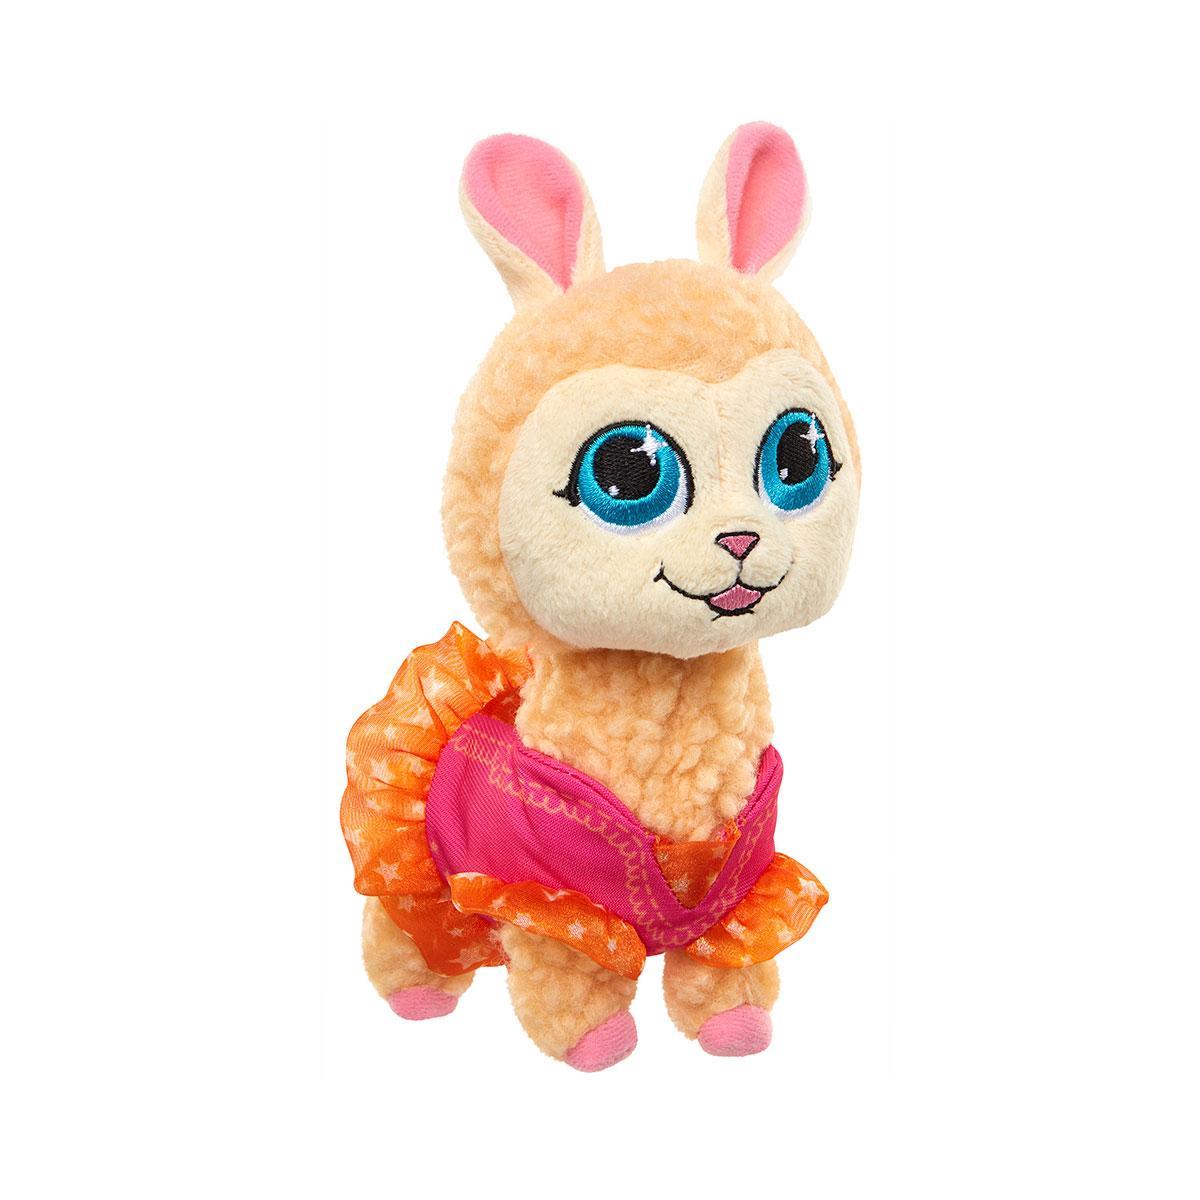 М'яка Іграшка Who's Your Llama? S1 - Денсі-Лама